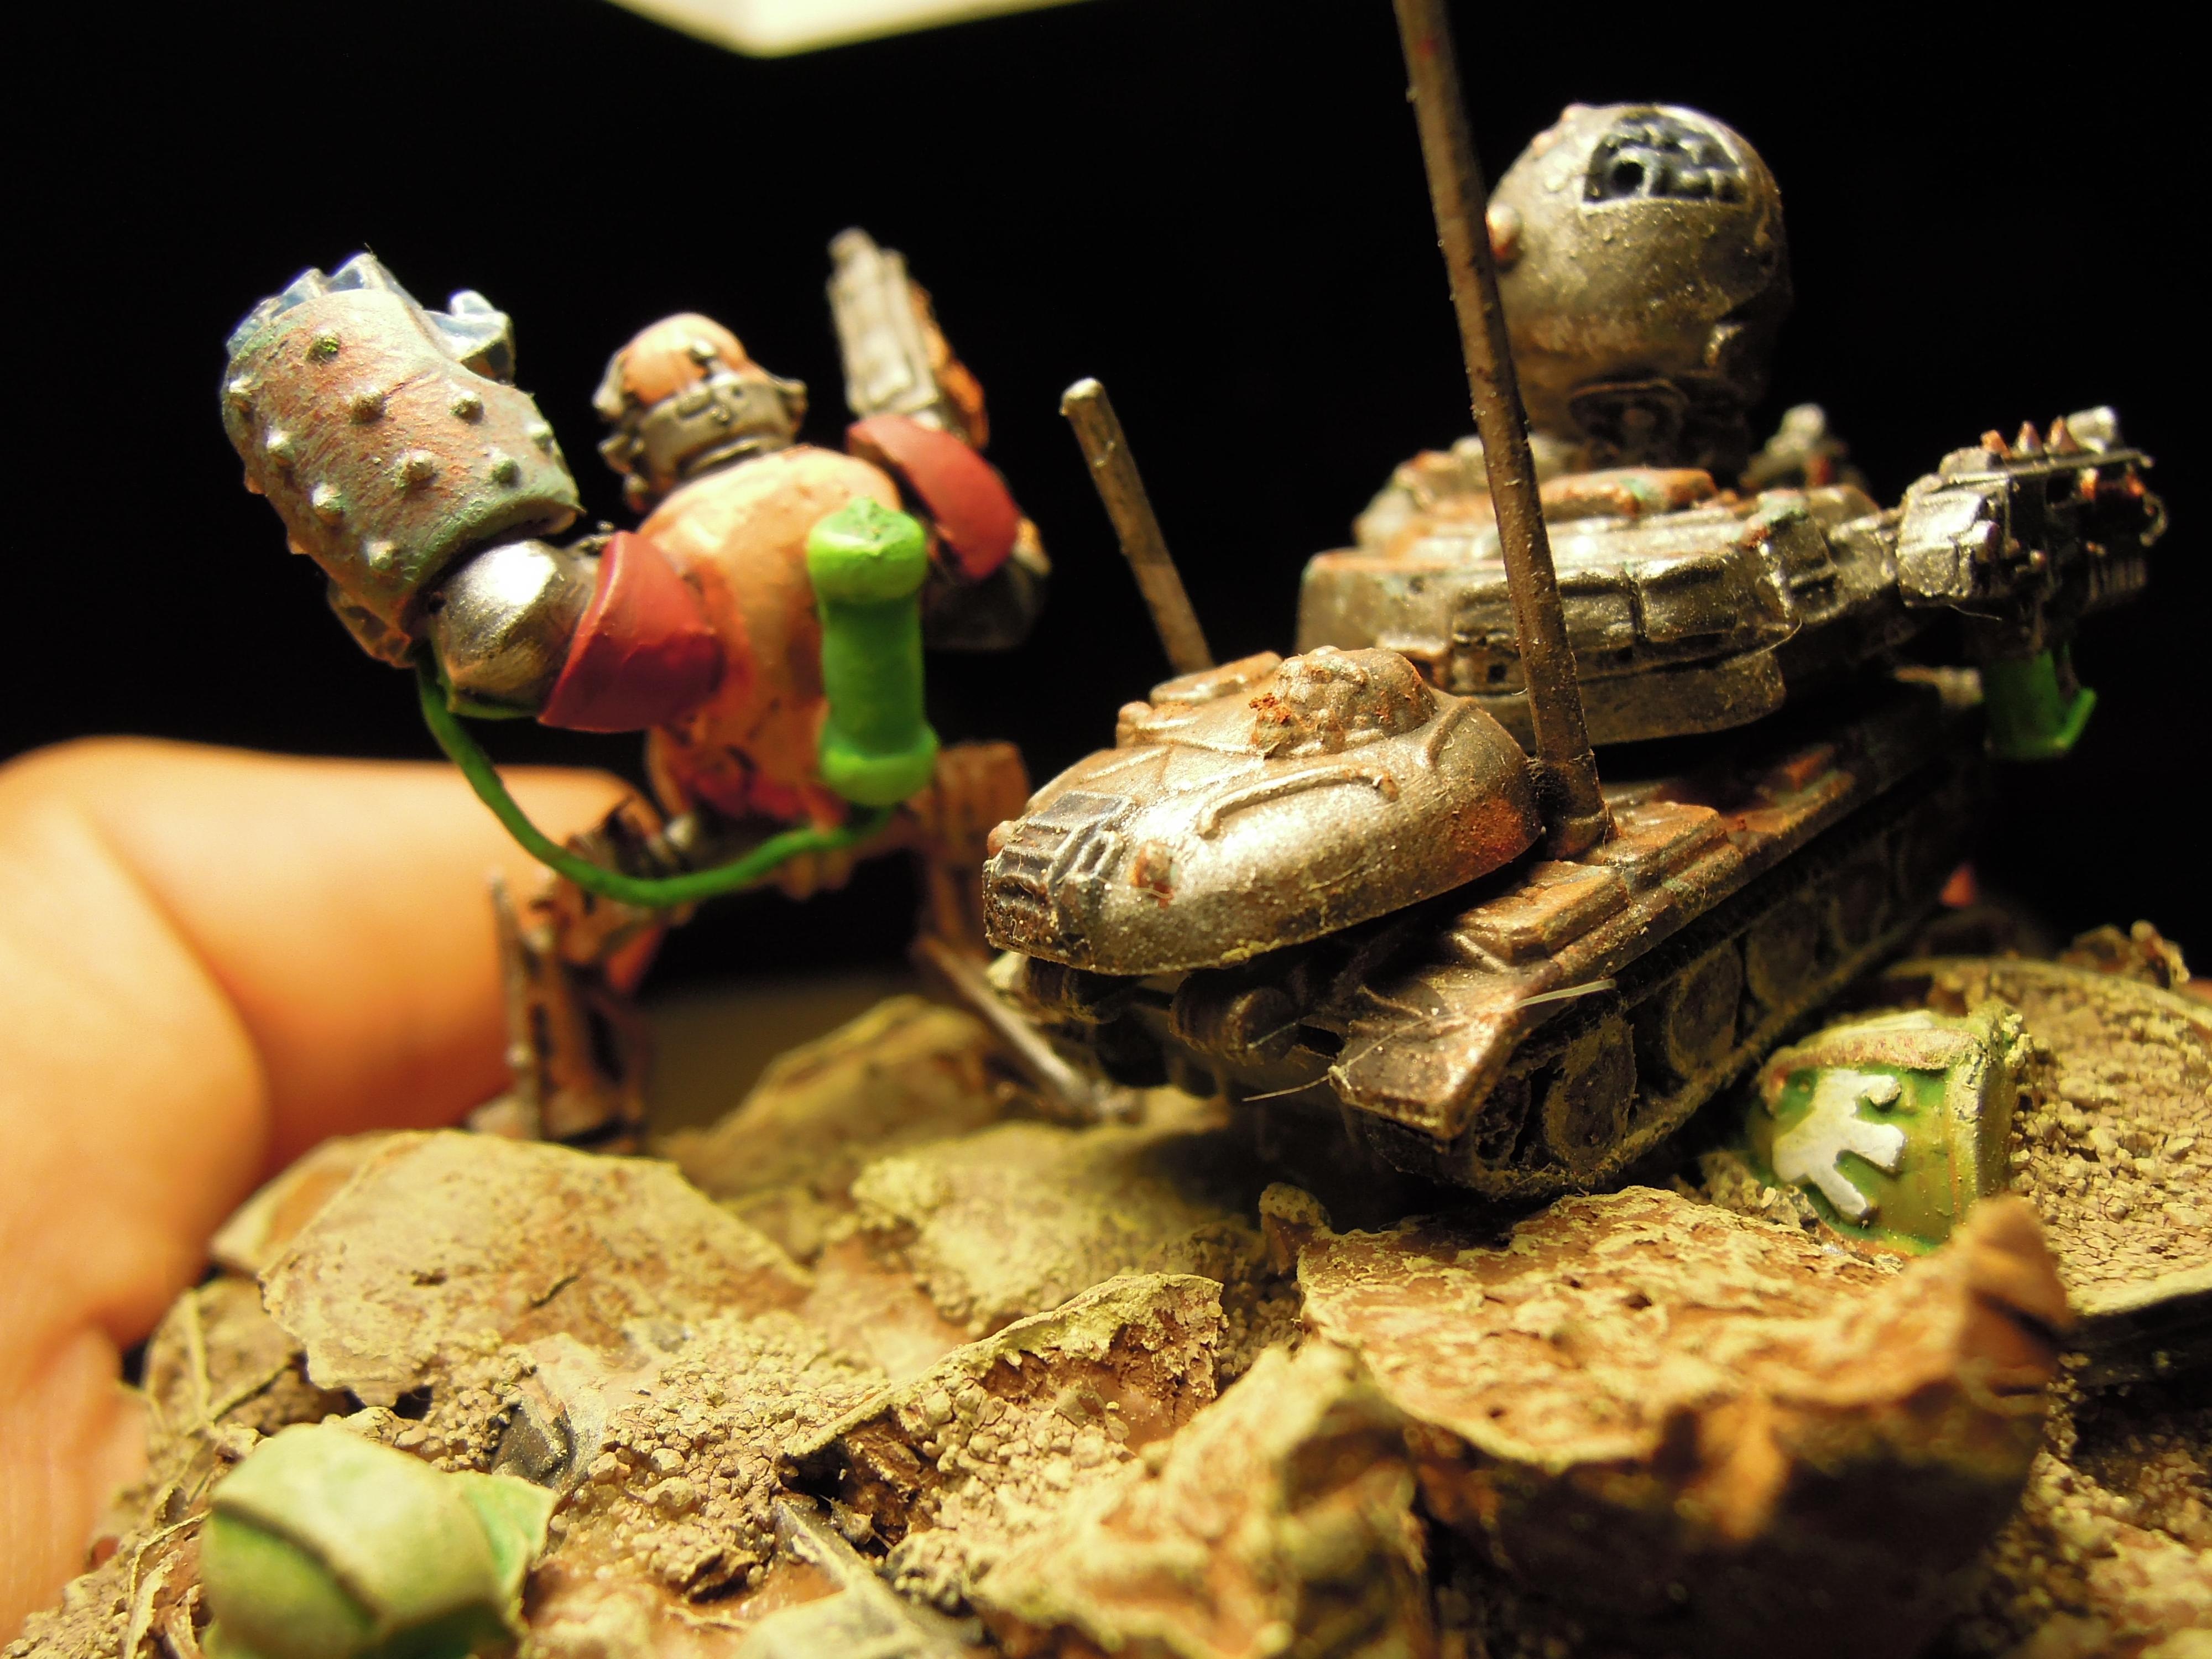 Admech, Bolter, Chaos, Conversion, Cyborg, Dark Mechanicus, Heresy, Kitbash, Power Fist, Retinue, Scratch Build, Servitors, Strogg, Tank, Warhammer 40,000